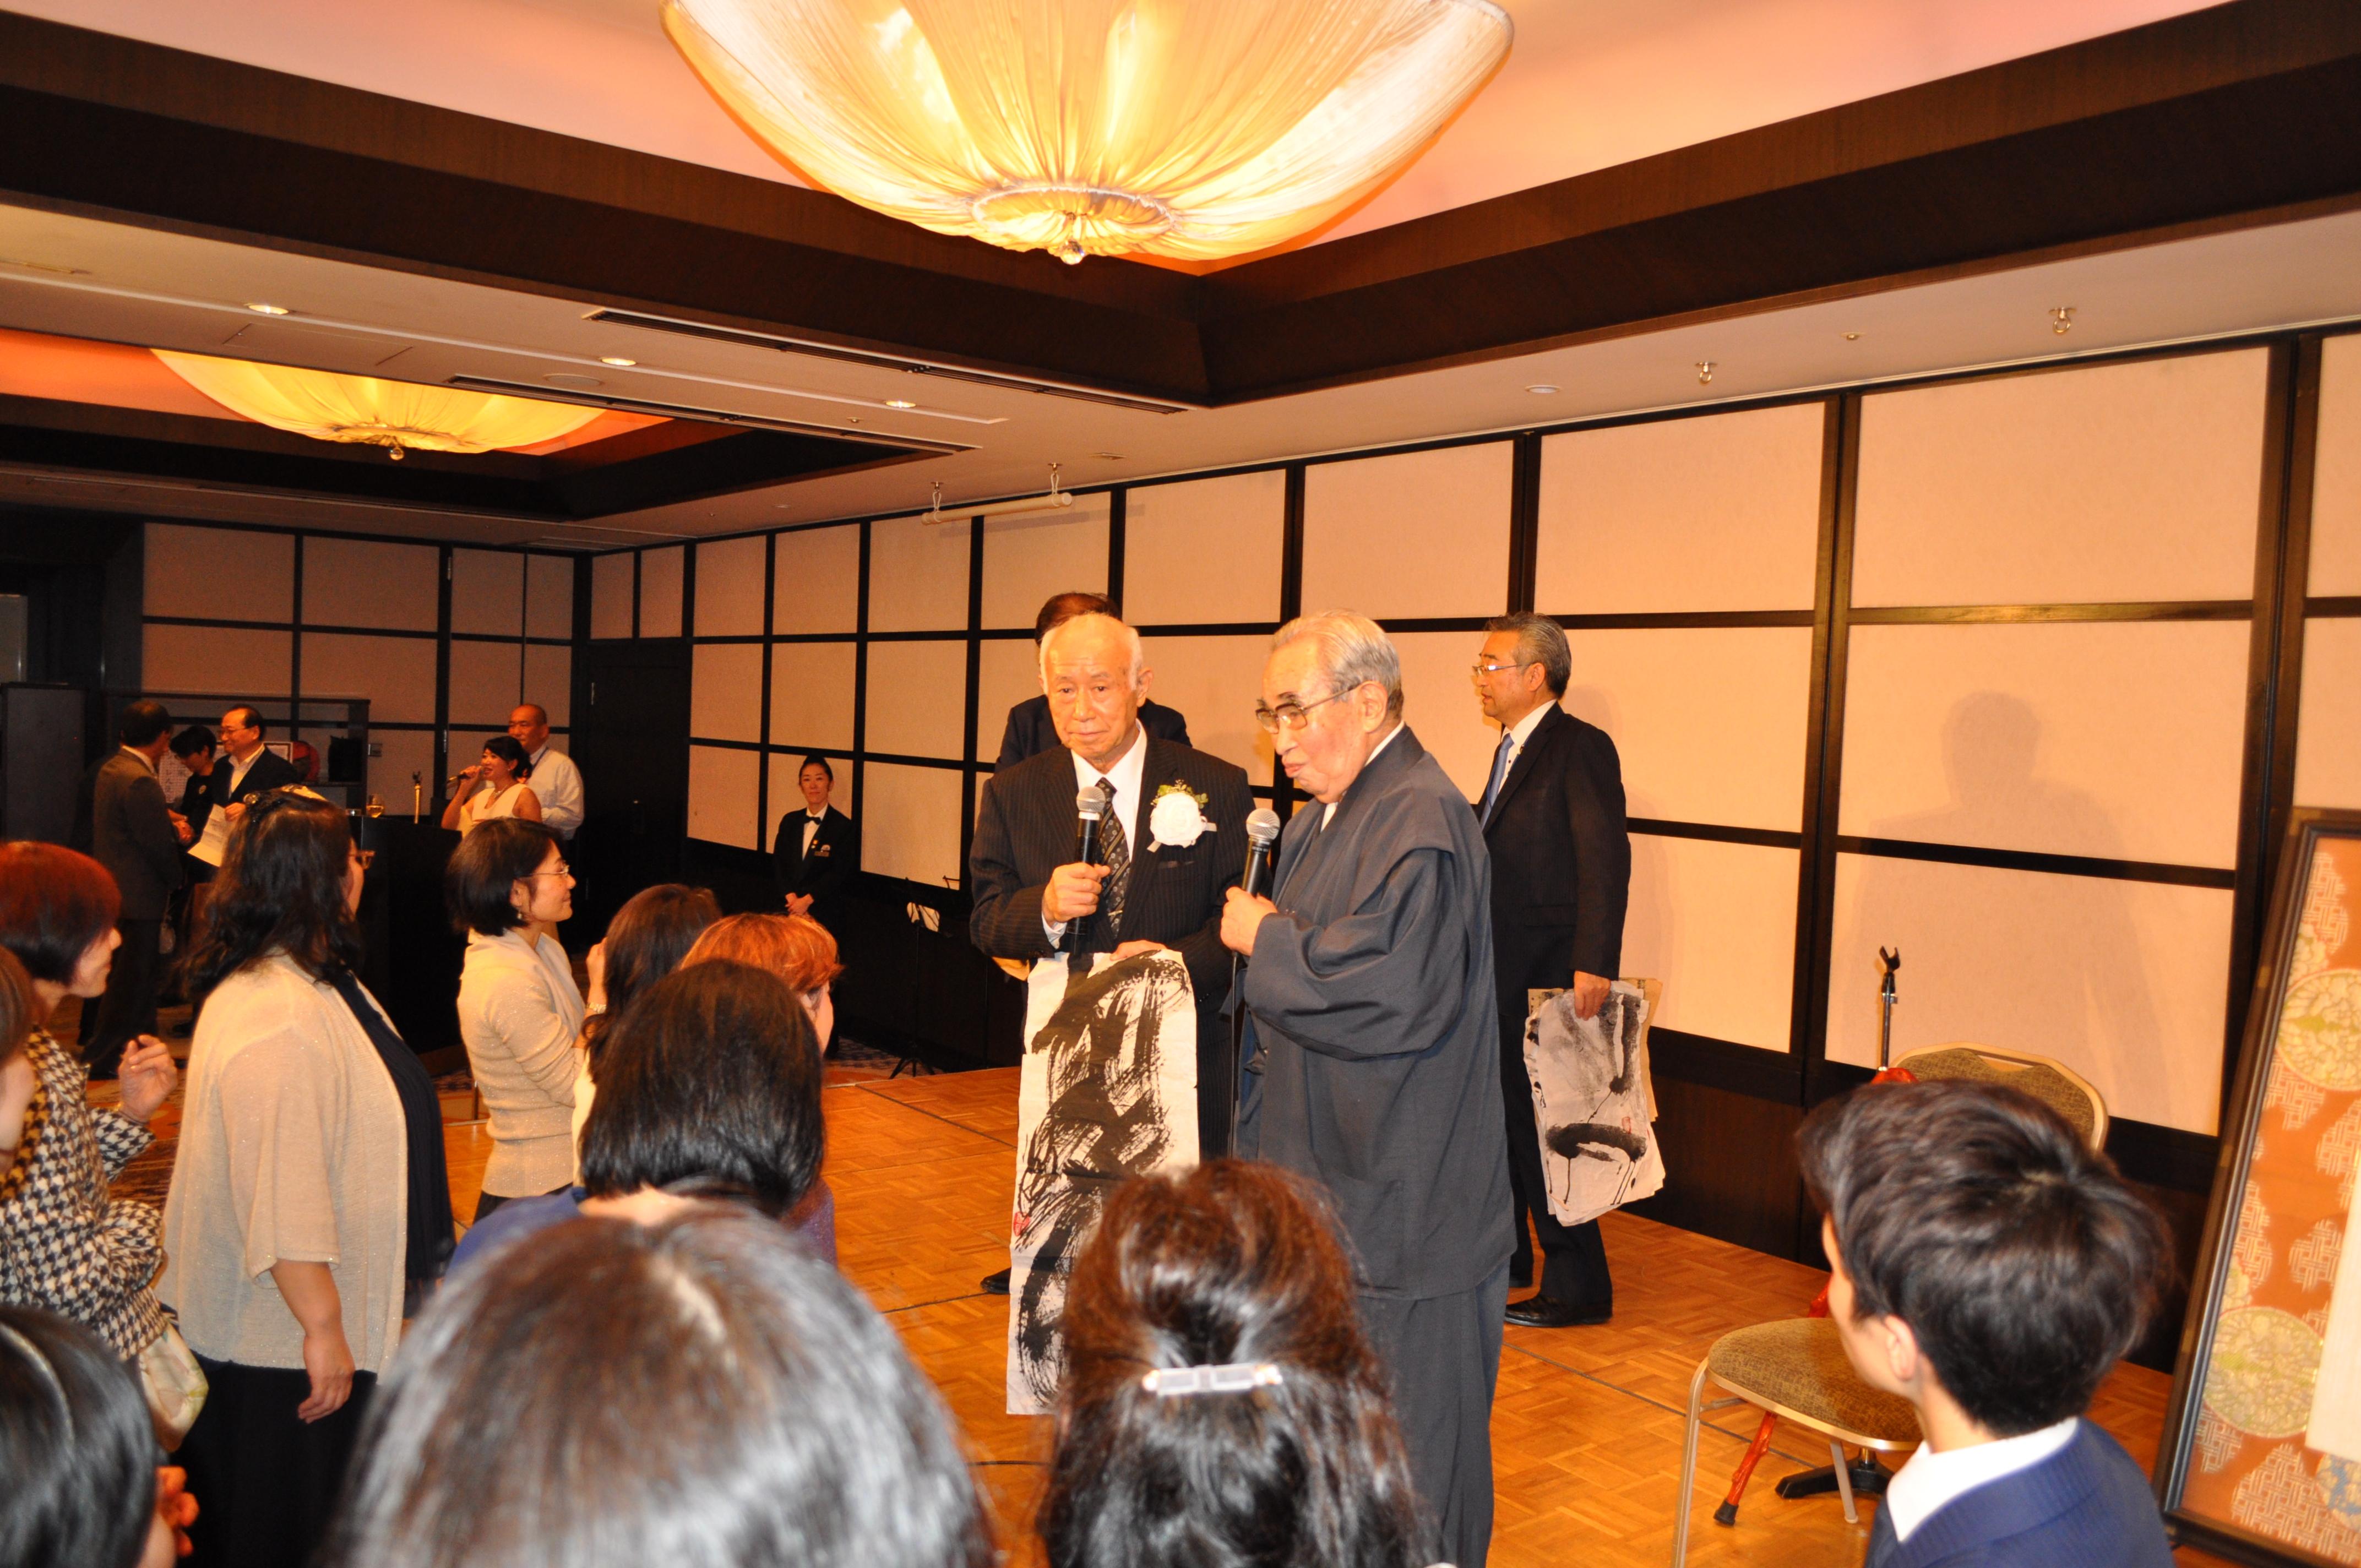 DSC 0598 - 第6回思風会全国大会2018in東京開催